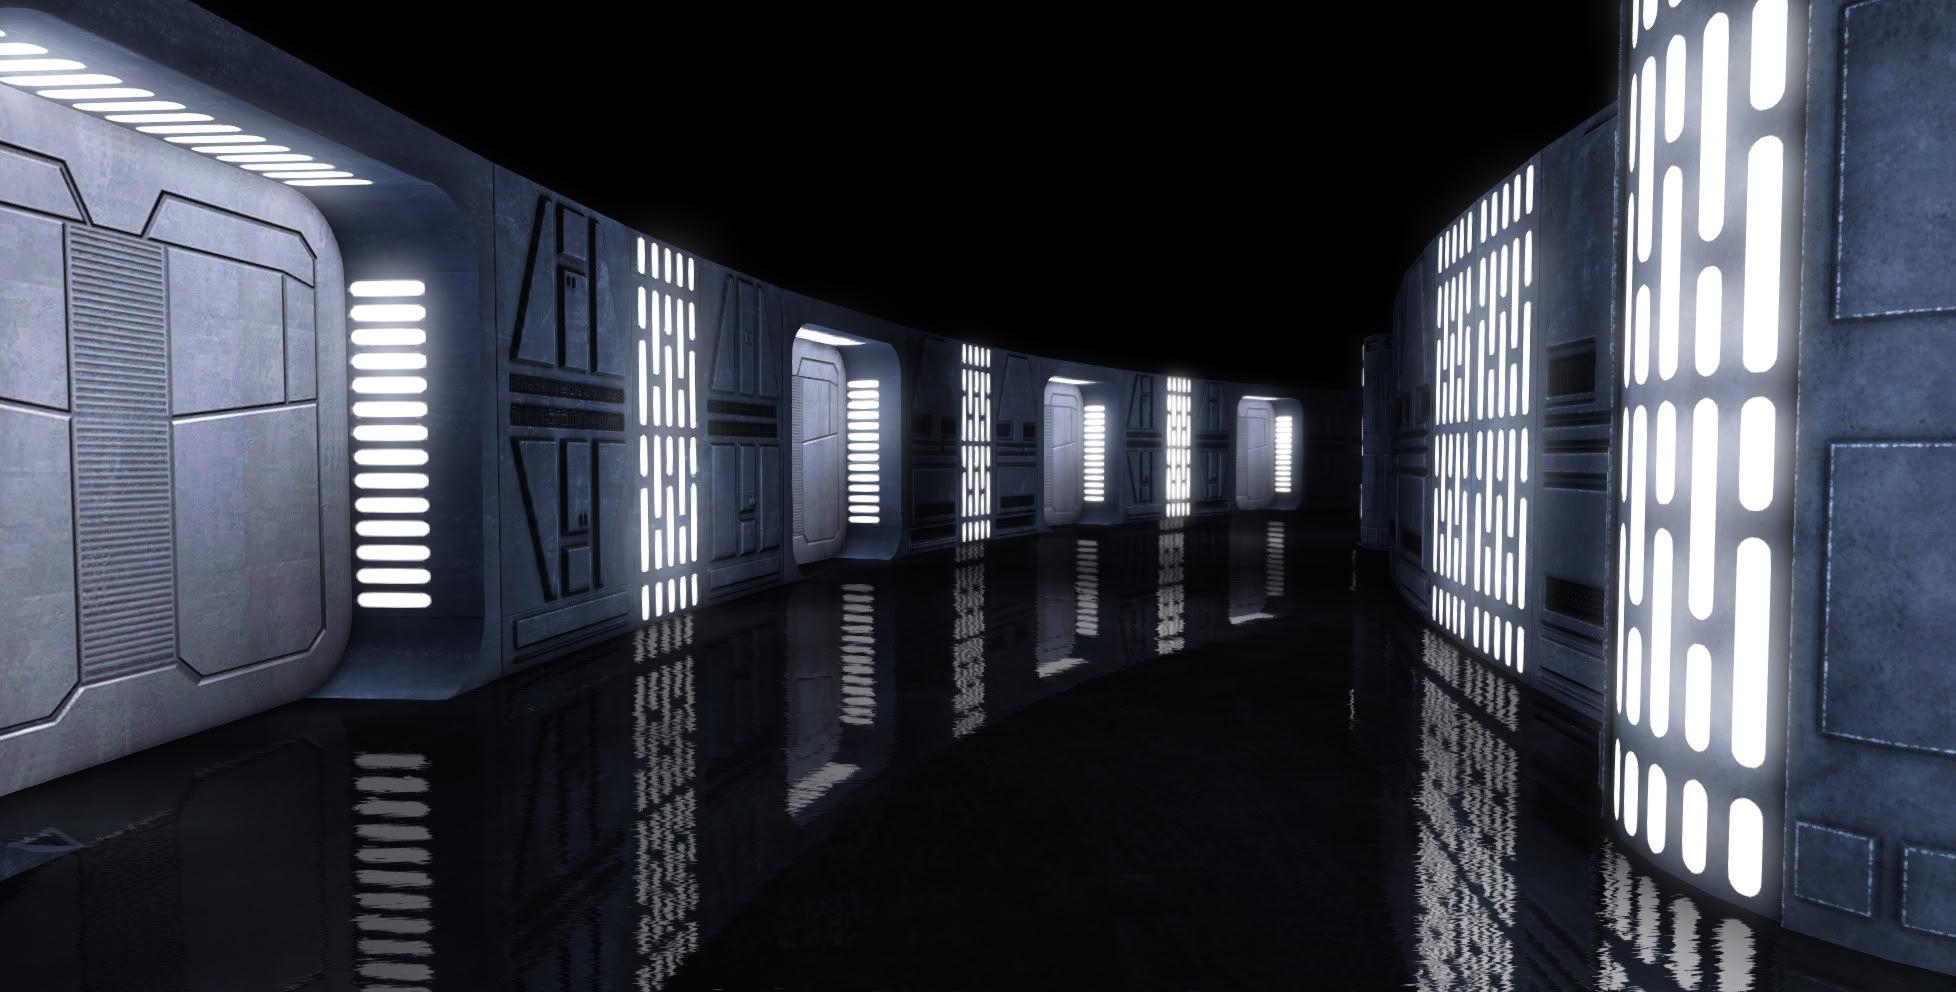 Star Wars 7 An Outlandish Death Star Theory